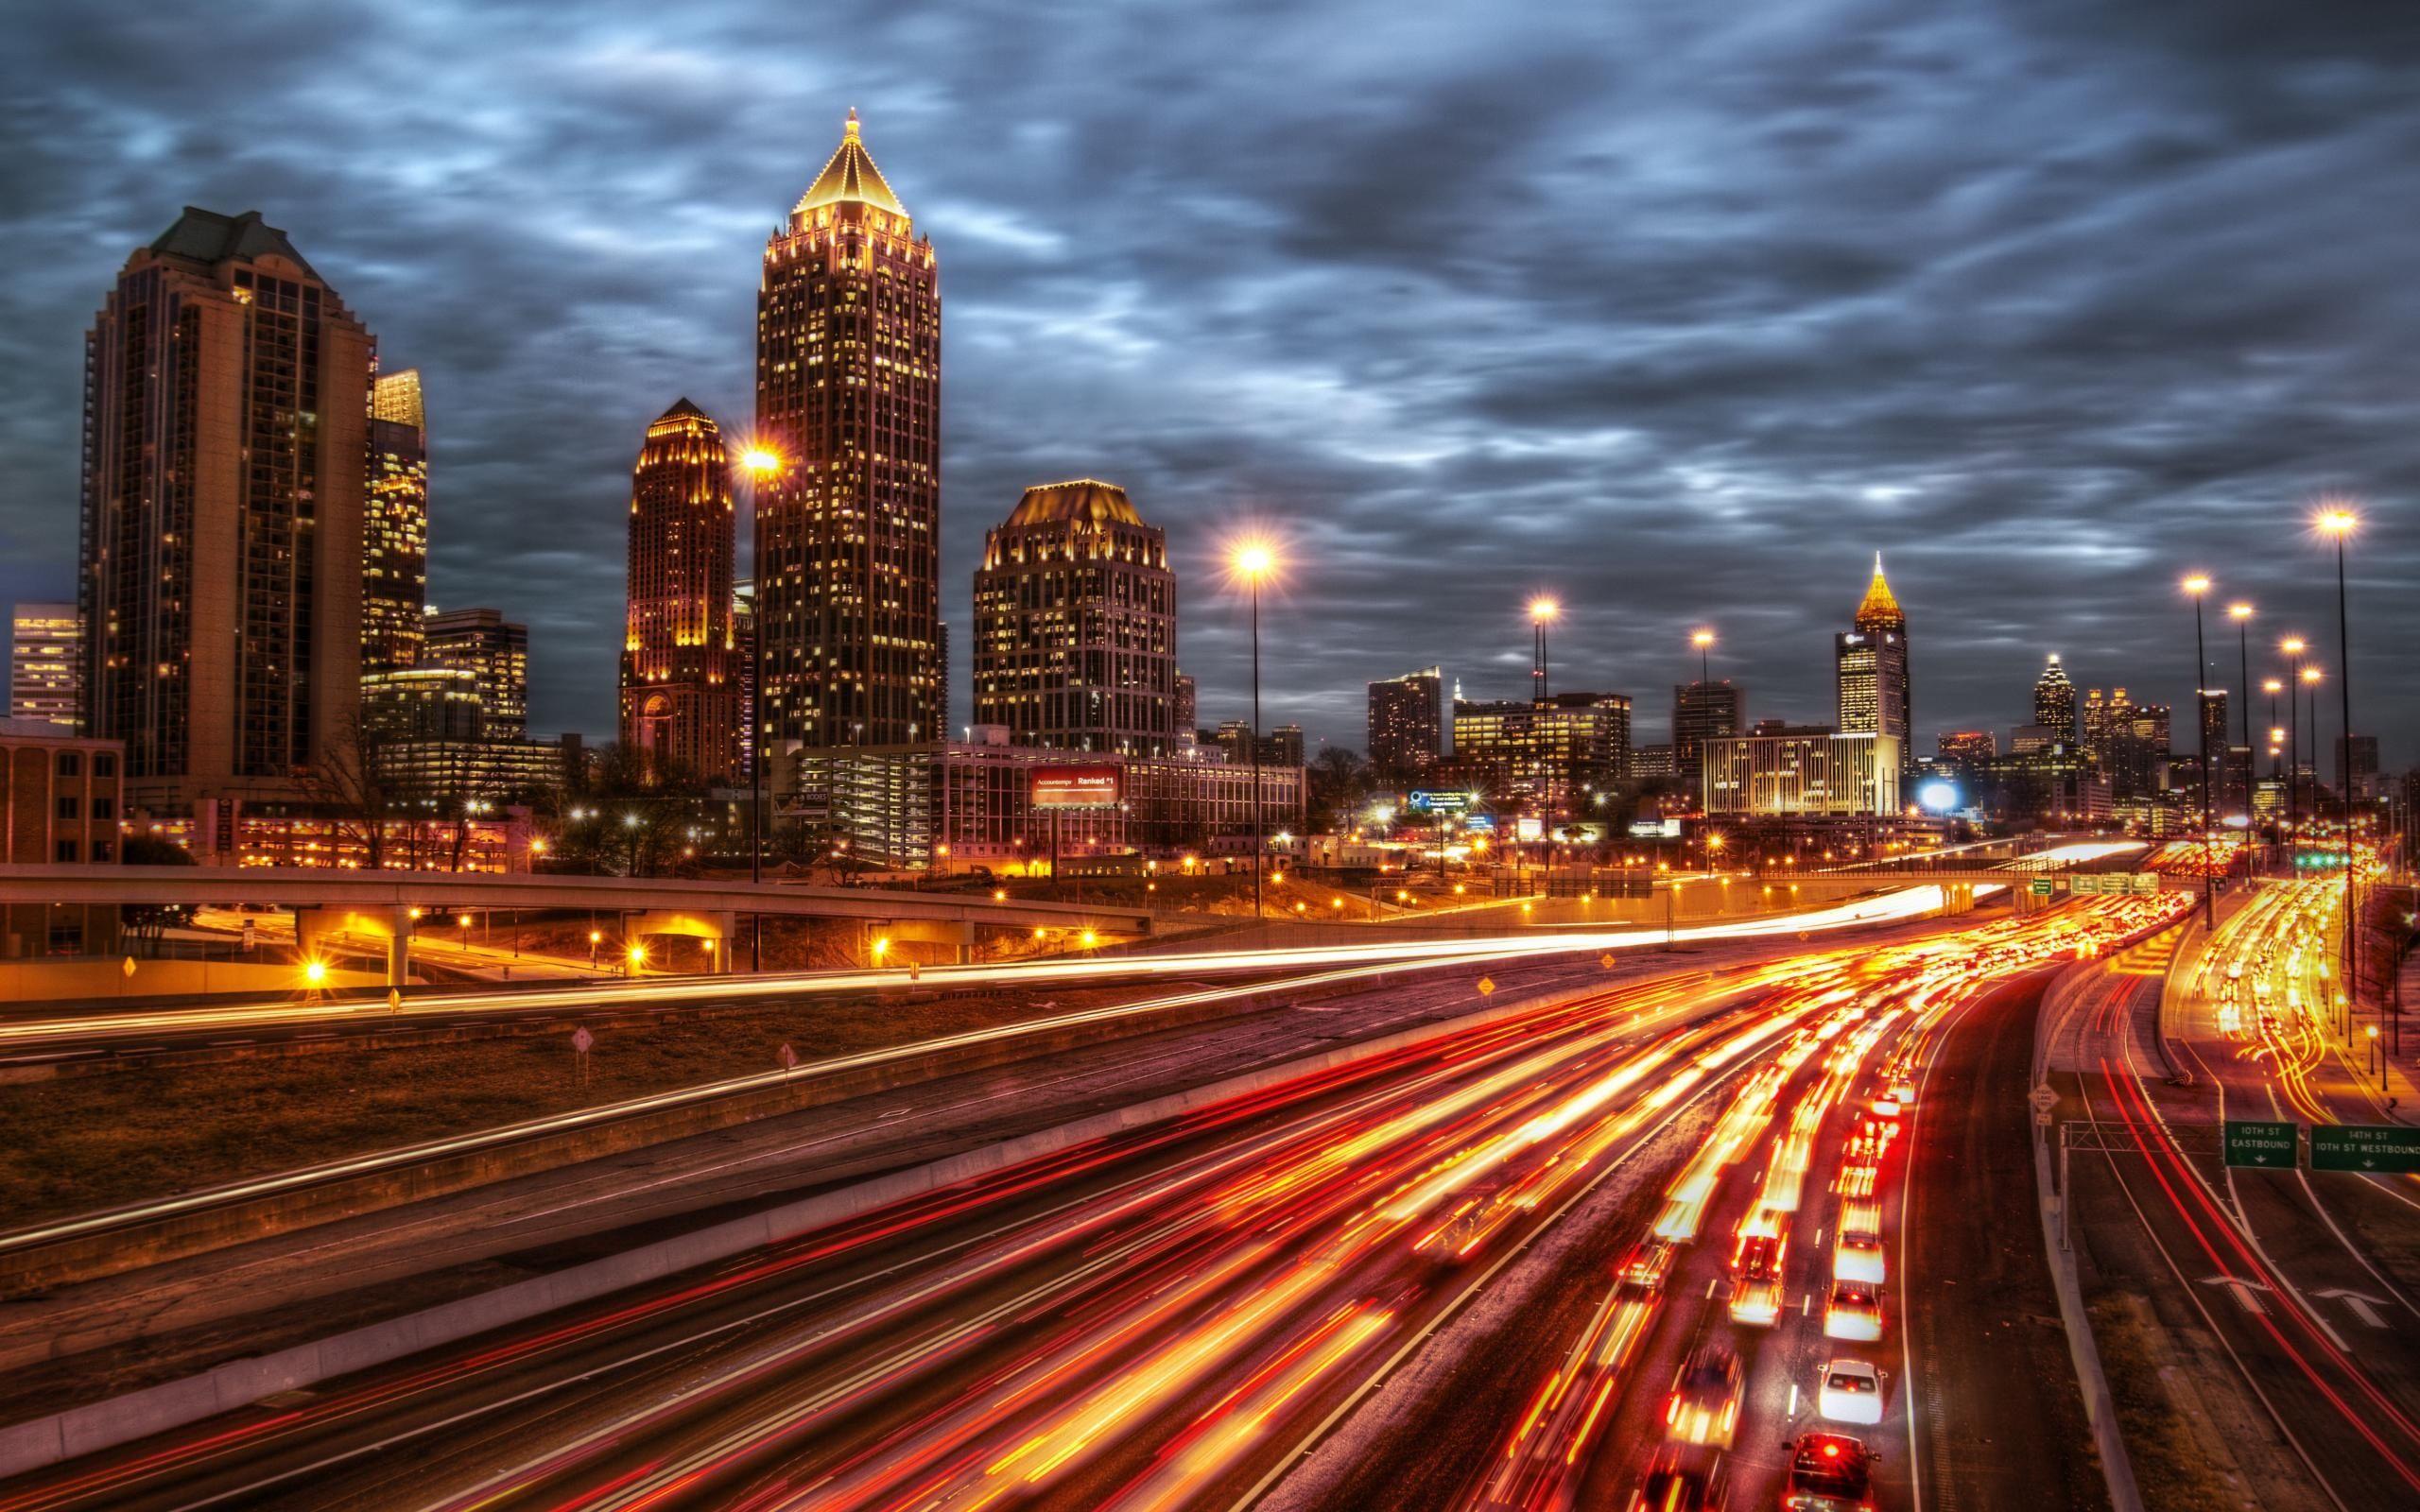 Atlanta City Night Usa Hd Wallpaper Download Awesome Nice